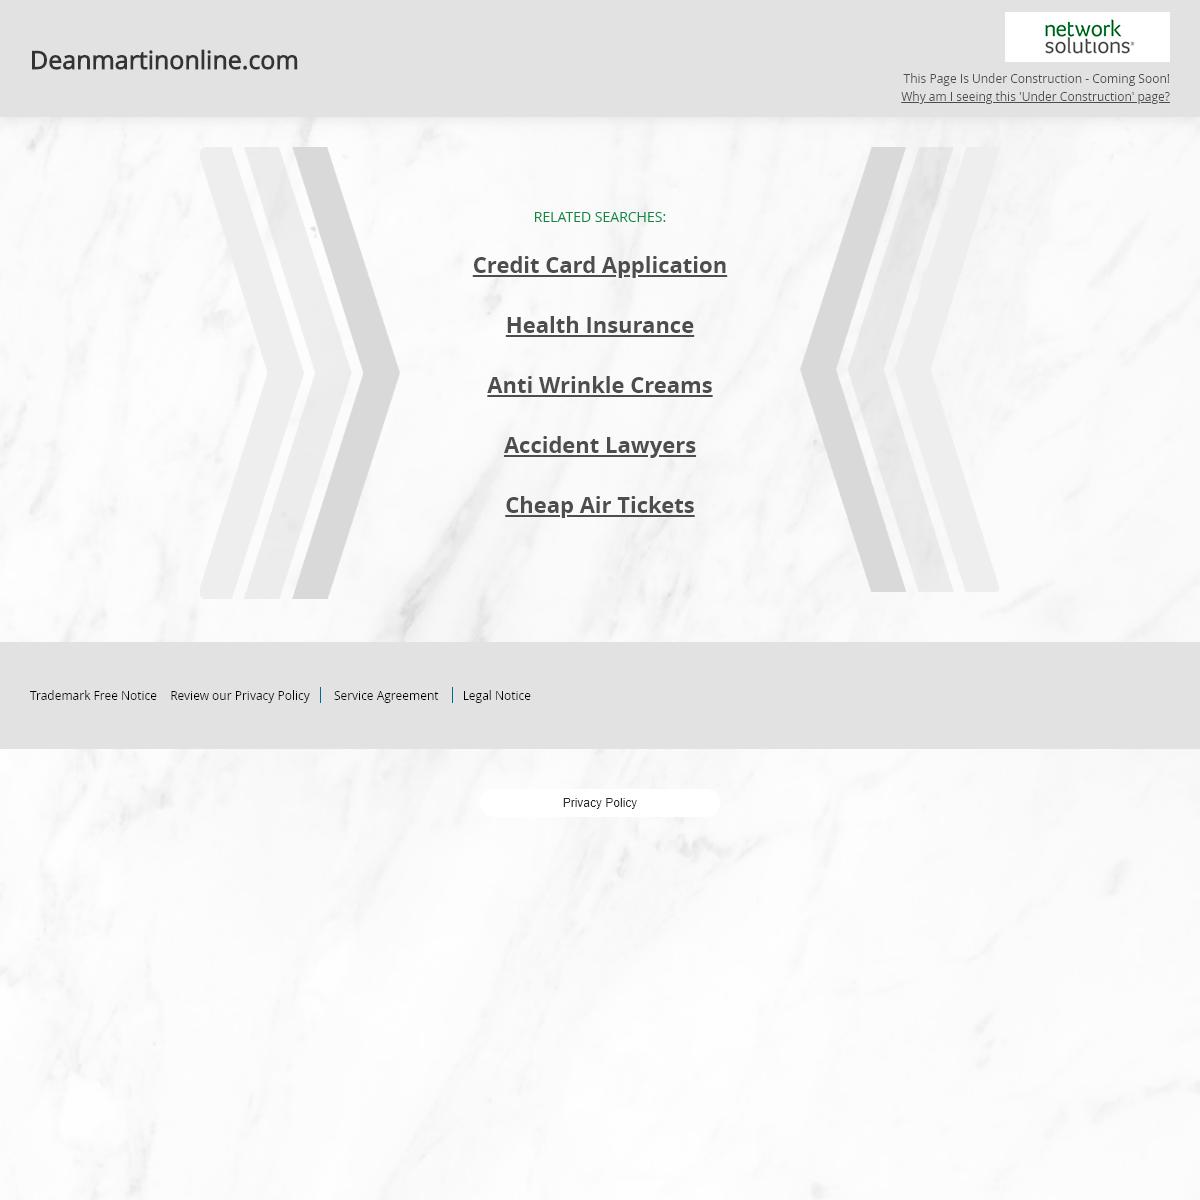 Deanmartinonline.com